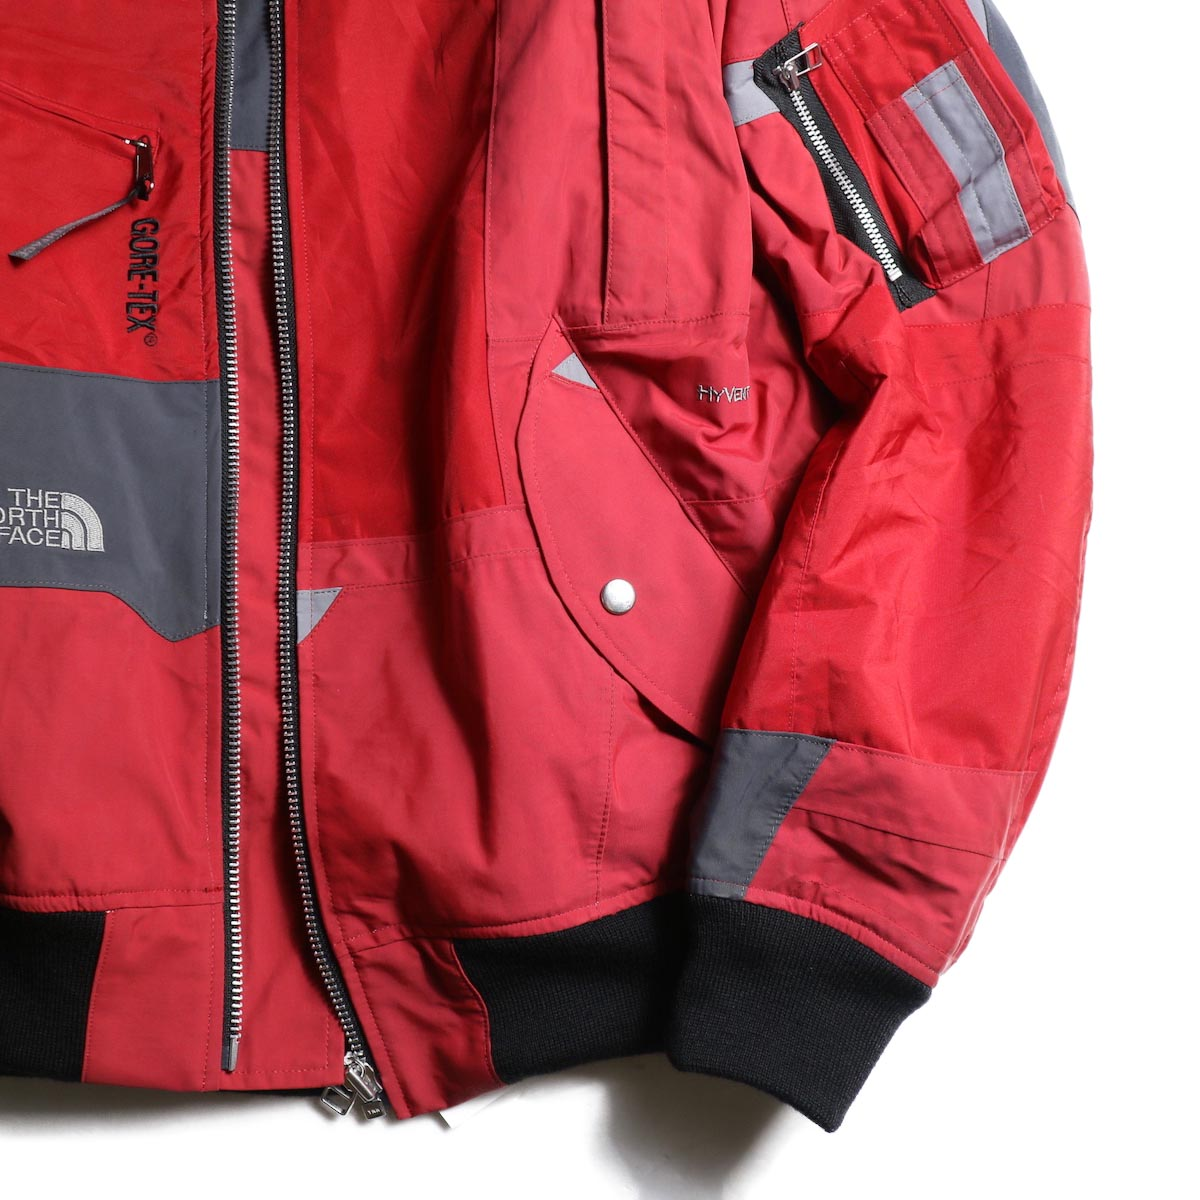 OLD PARK / Flight Jacket (OUTDOOR)(Lsize)袖、裾